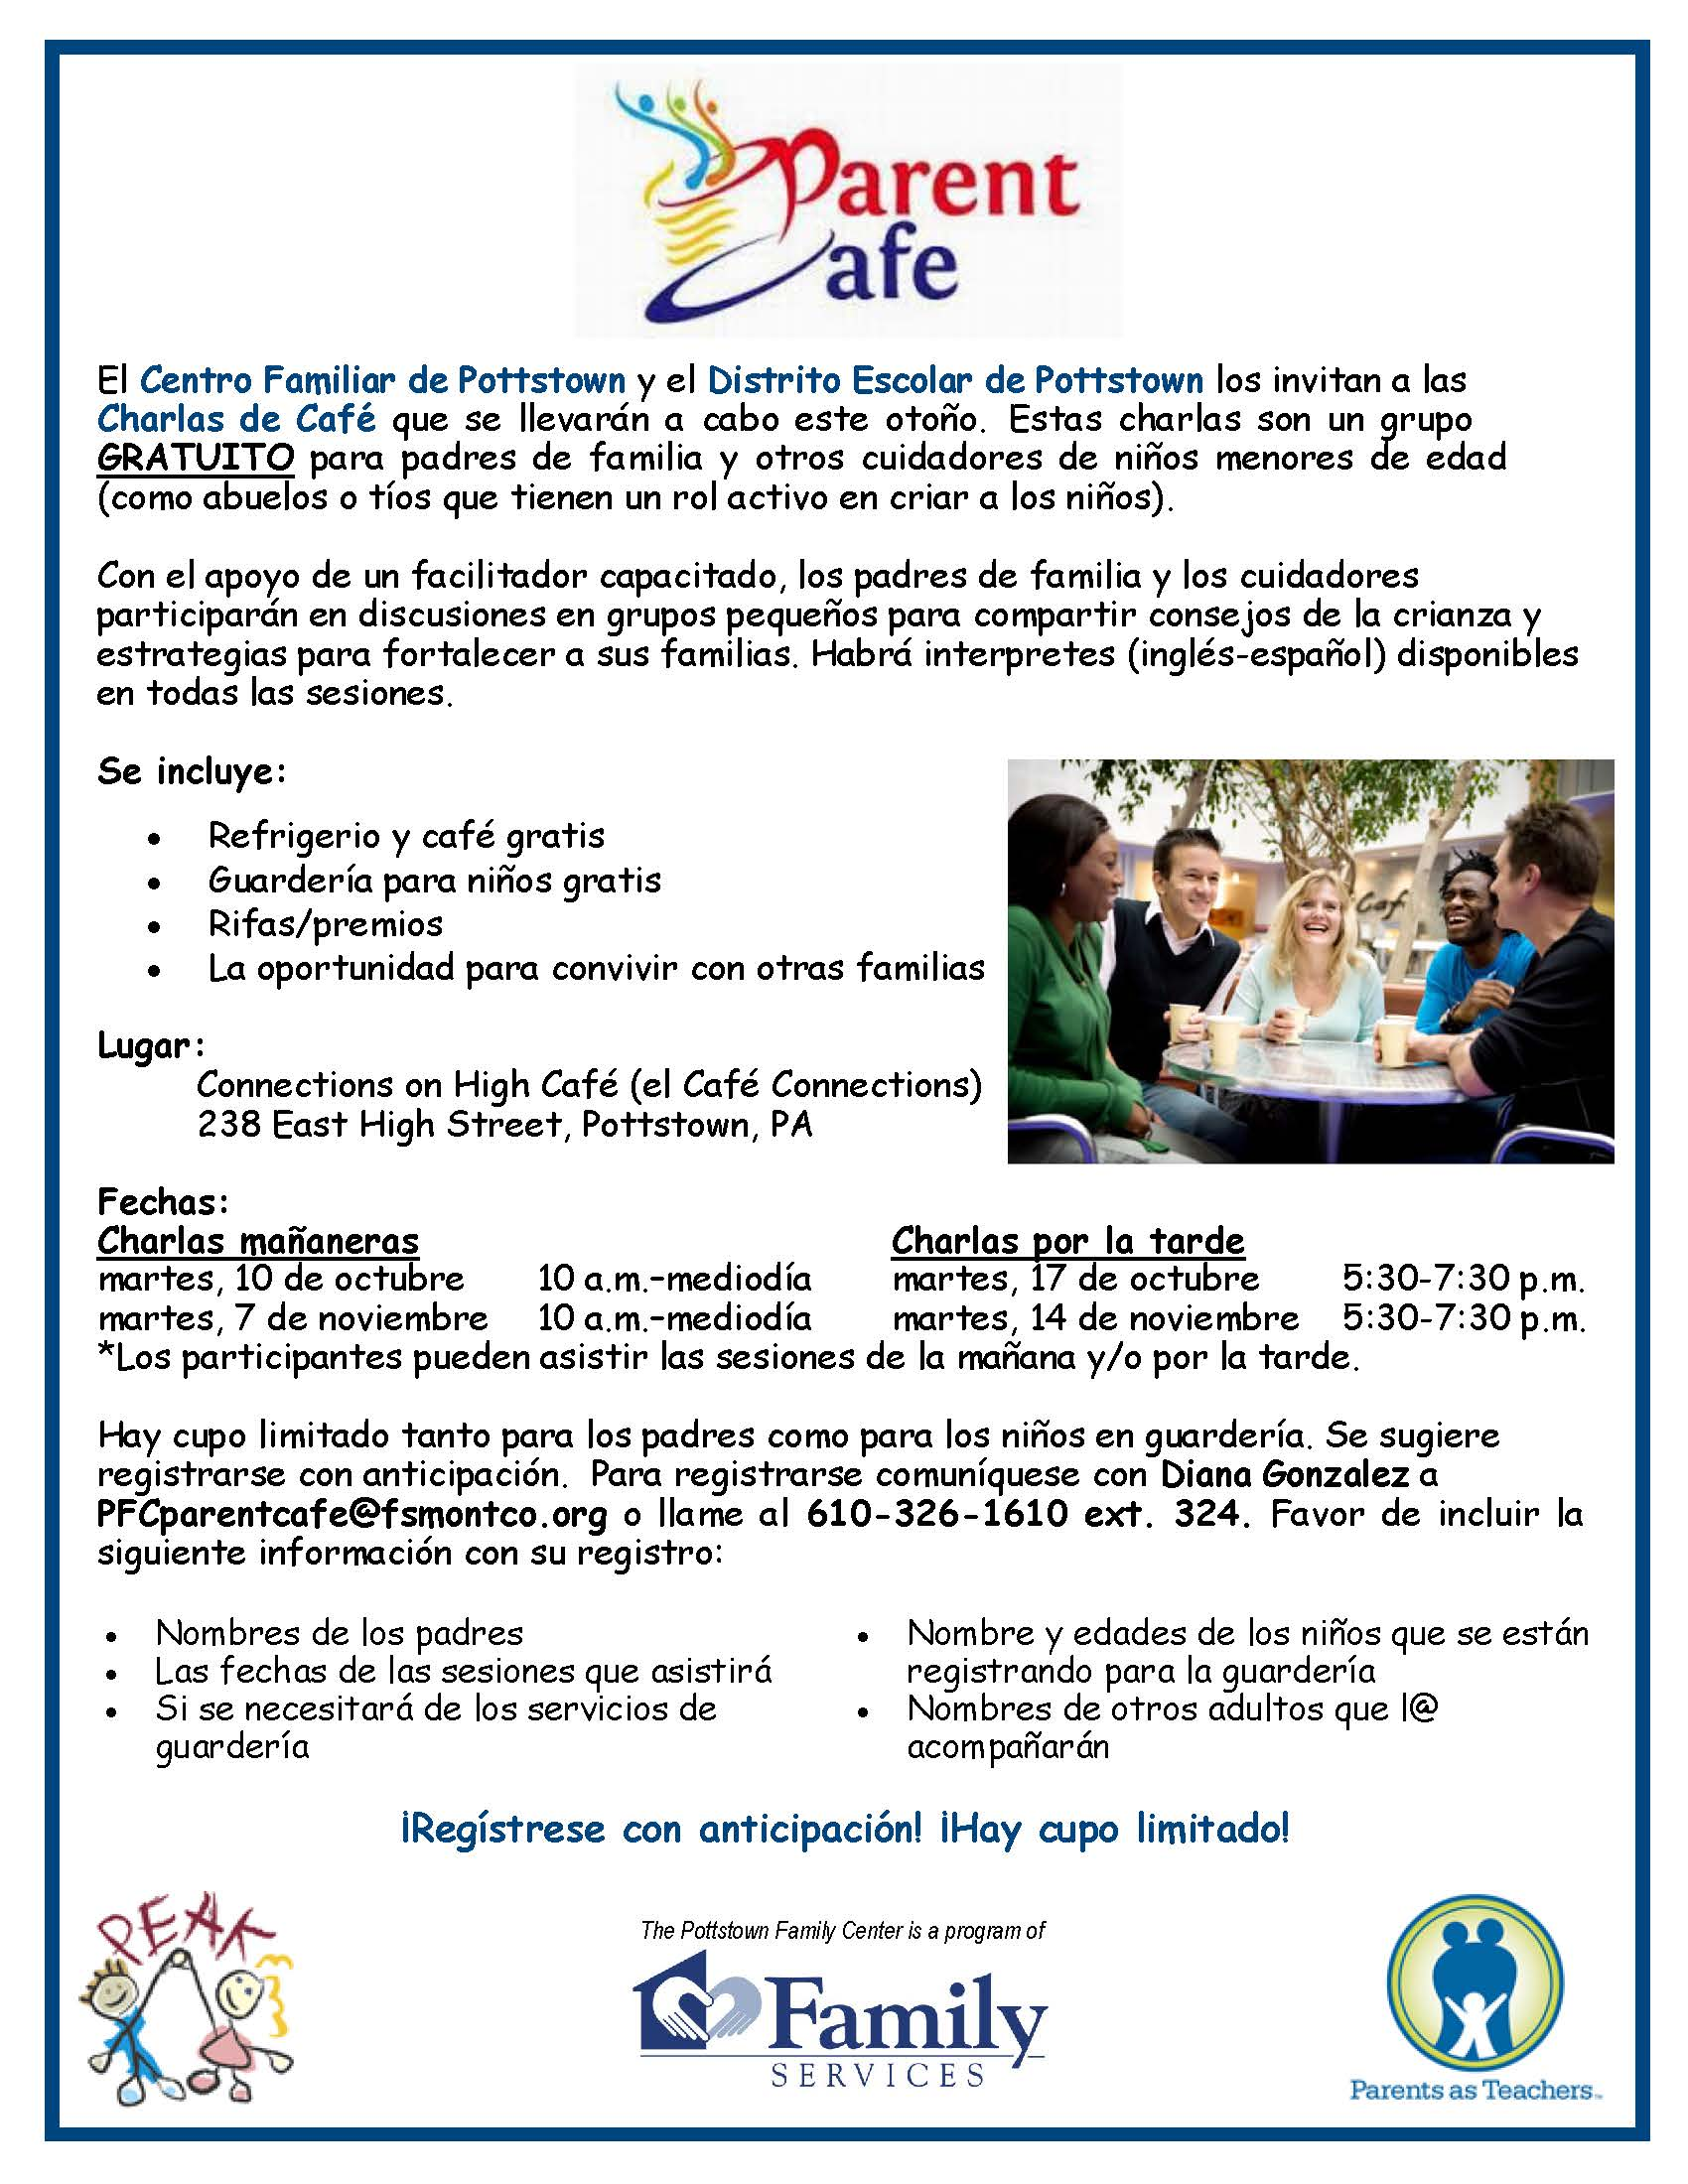 Parent Cafe flyer Fall 2017 Spanish.jpg